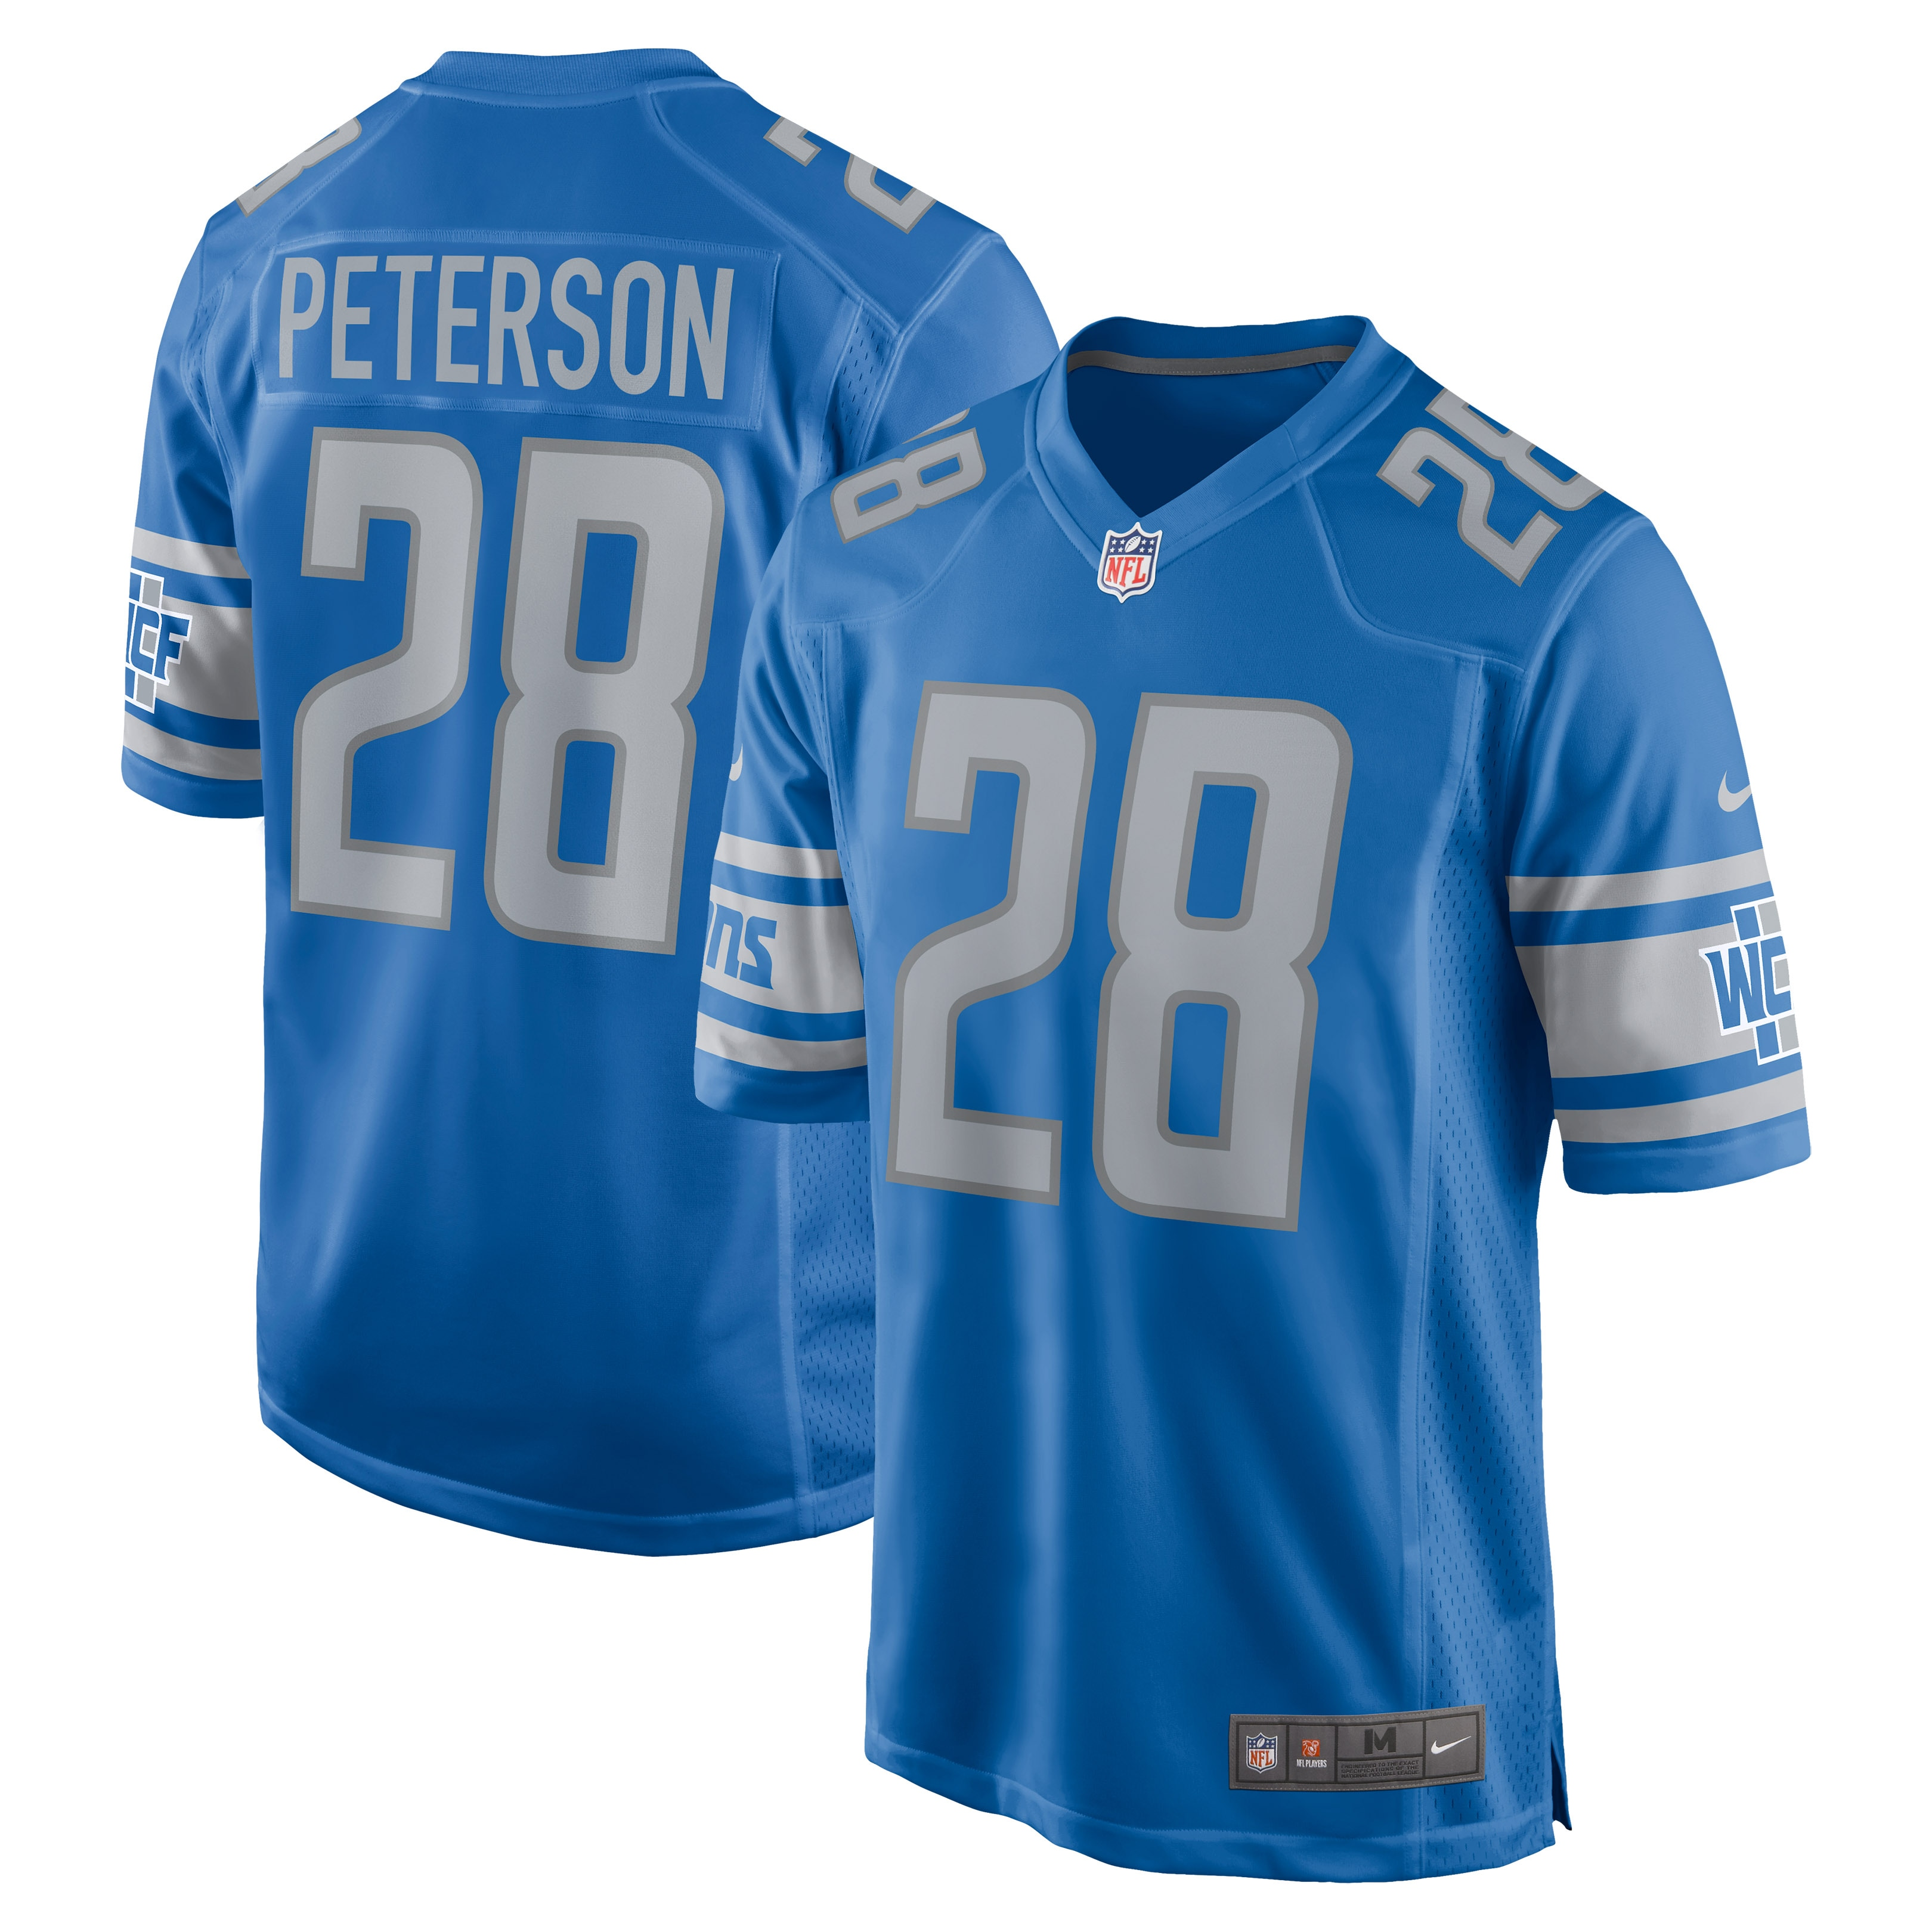 Adrian Peterson Detroit Lions Nike Game Jersey - Blue - Walmart.com